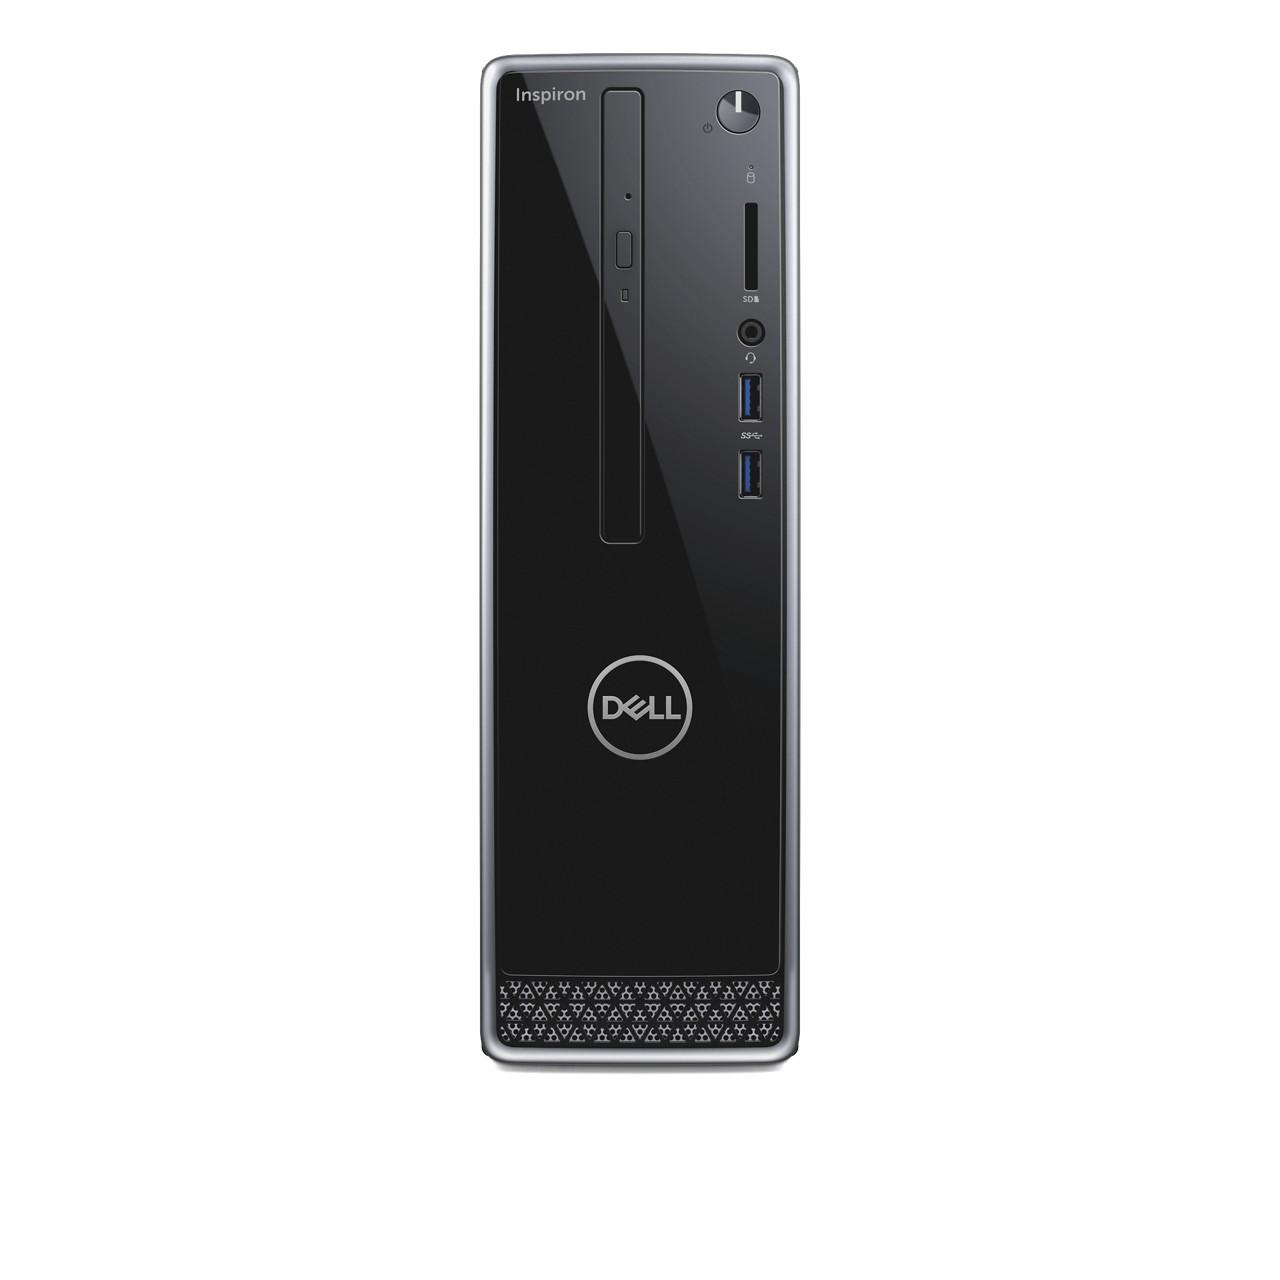 Dell Inspiron 3470 Desktop (i3-8100 / 4GB / 1TB) + 6% Rakuten.com Credit